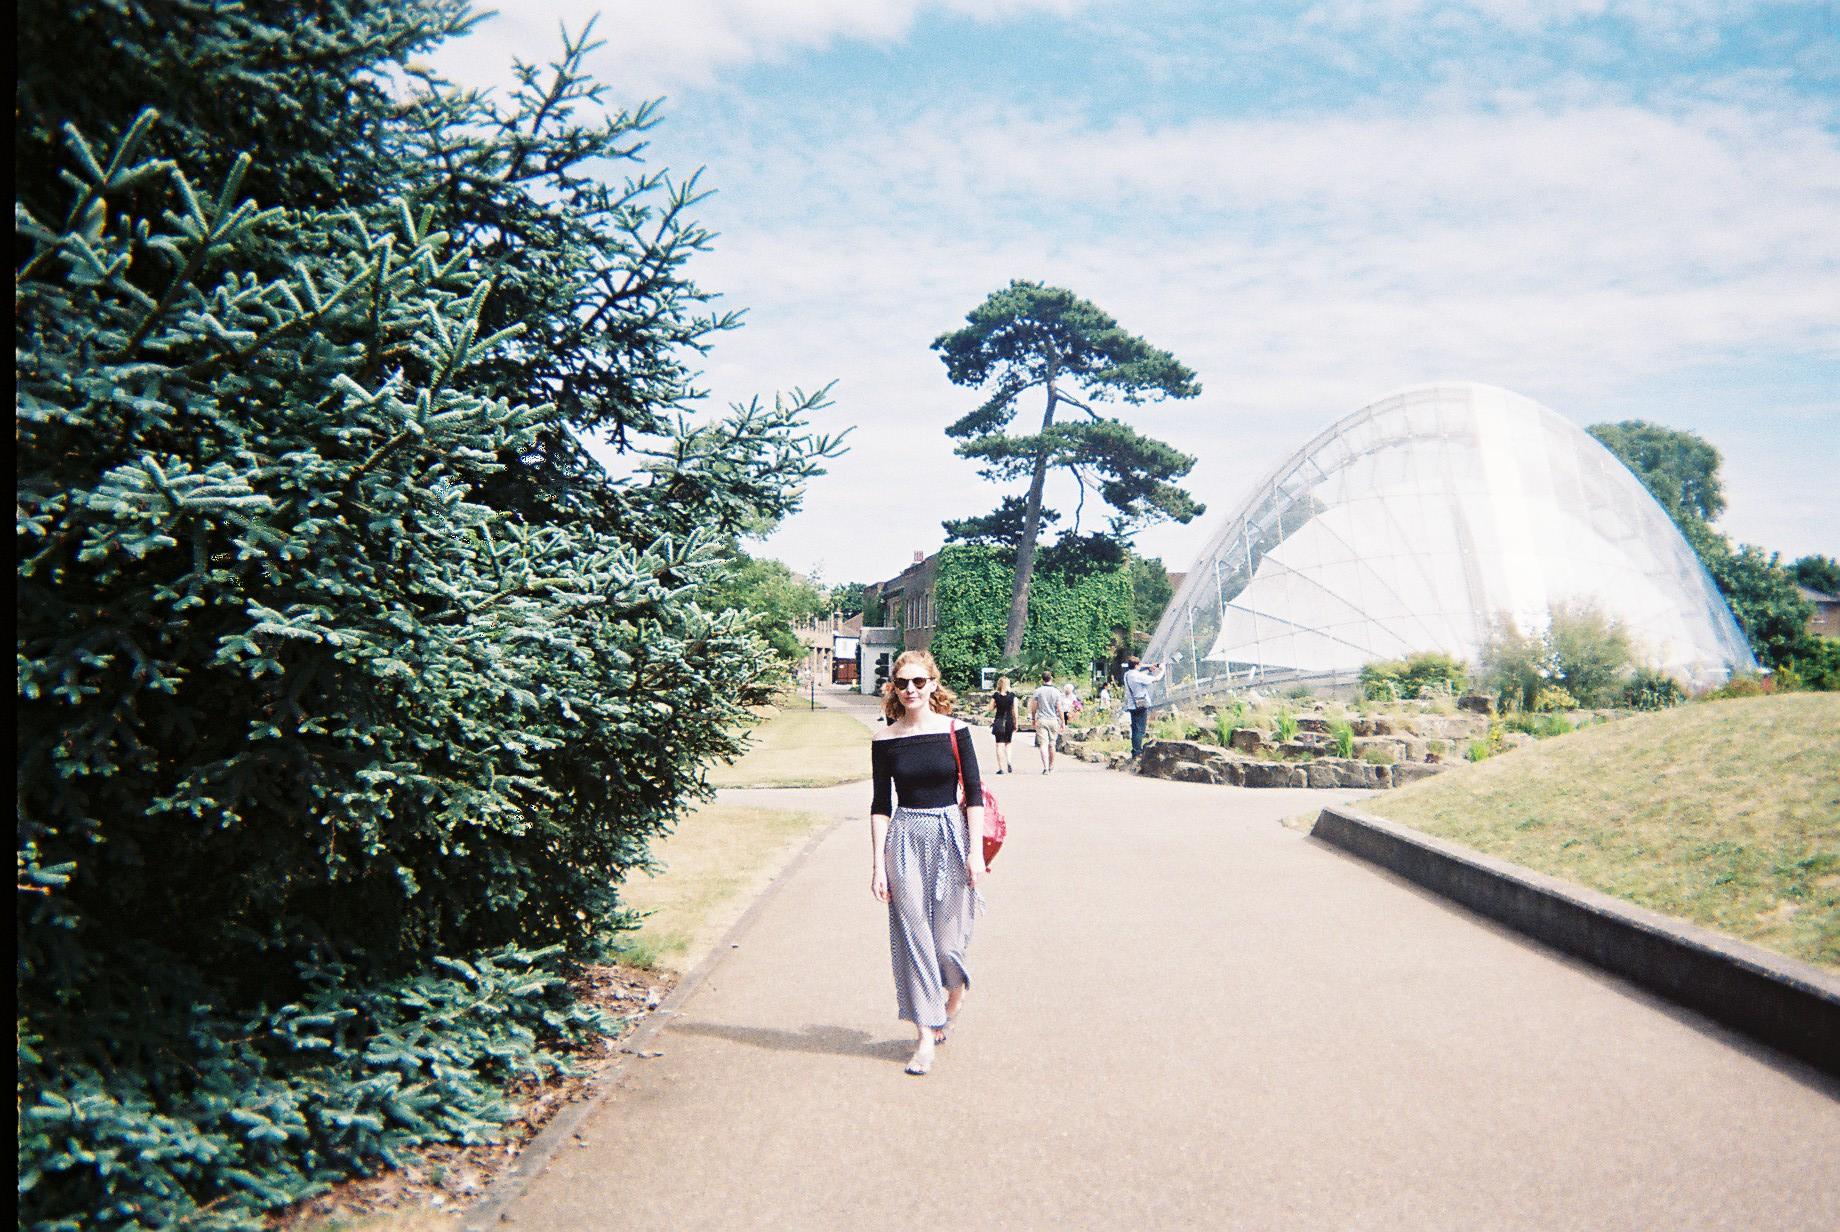 8th July - Kew Gardens